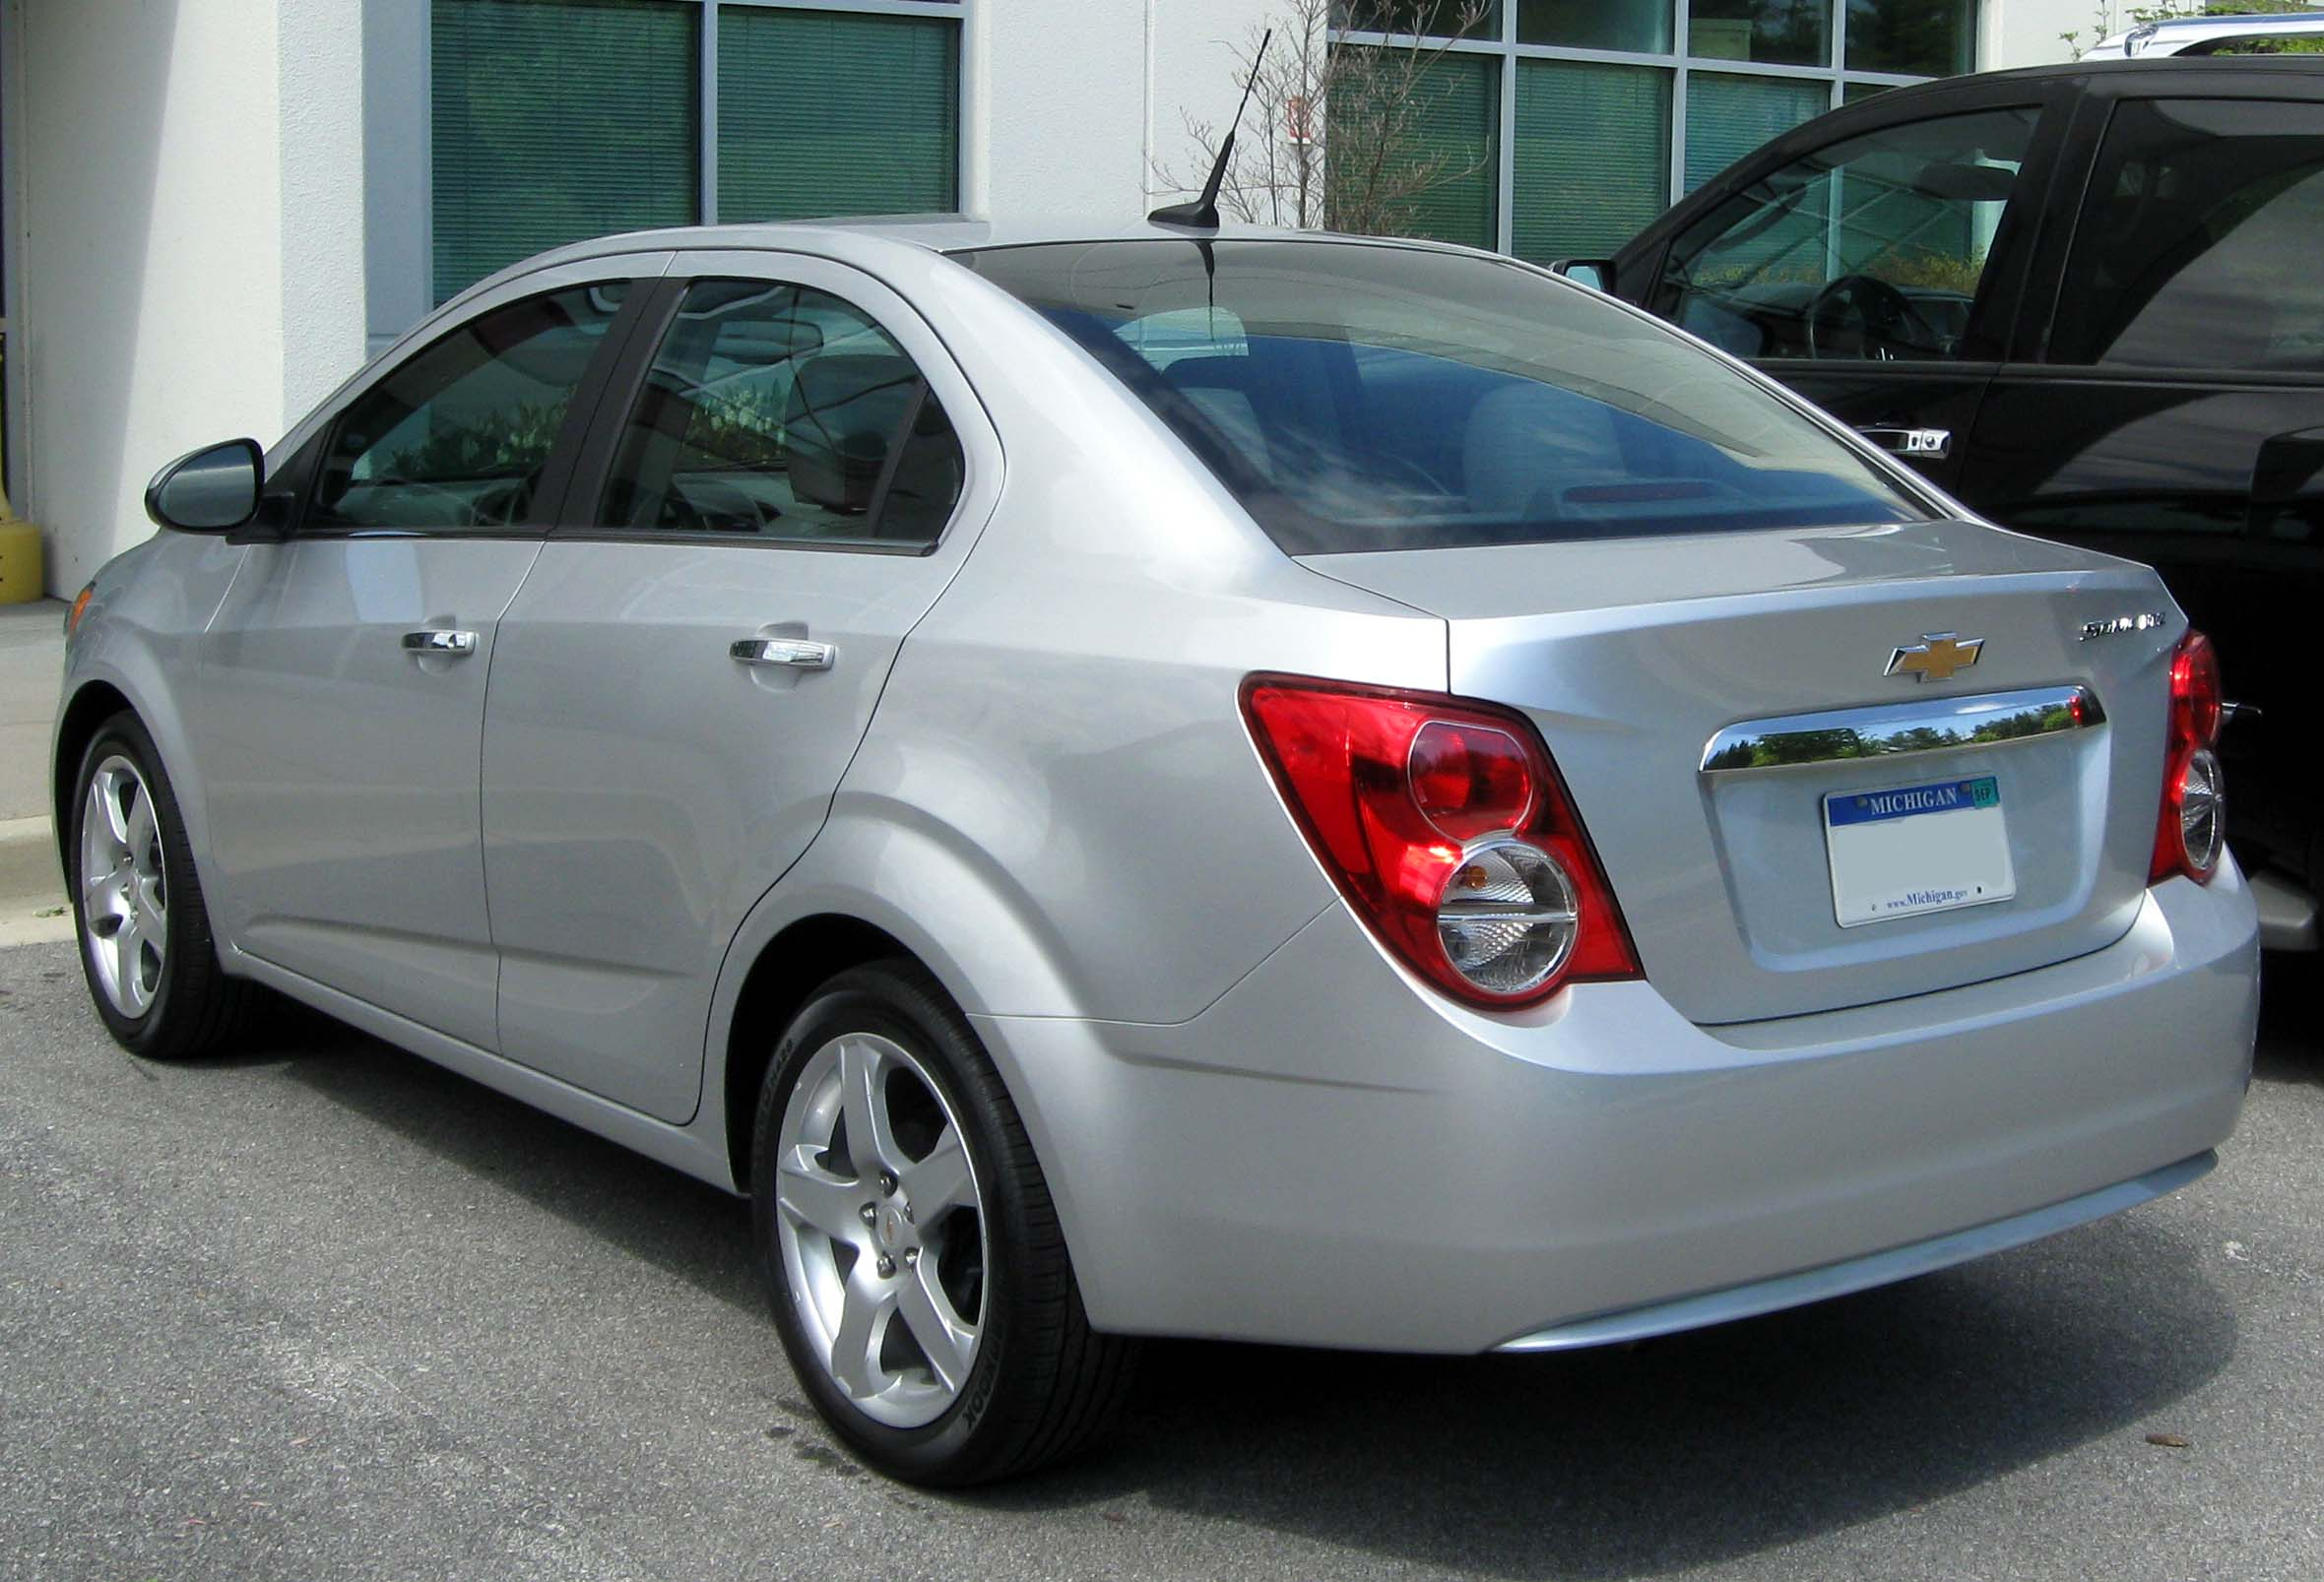 2012 Chevrolet Sonic Sedan LTZ